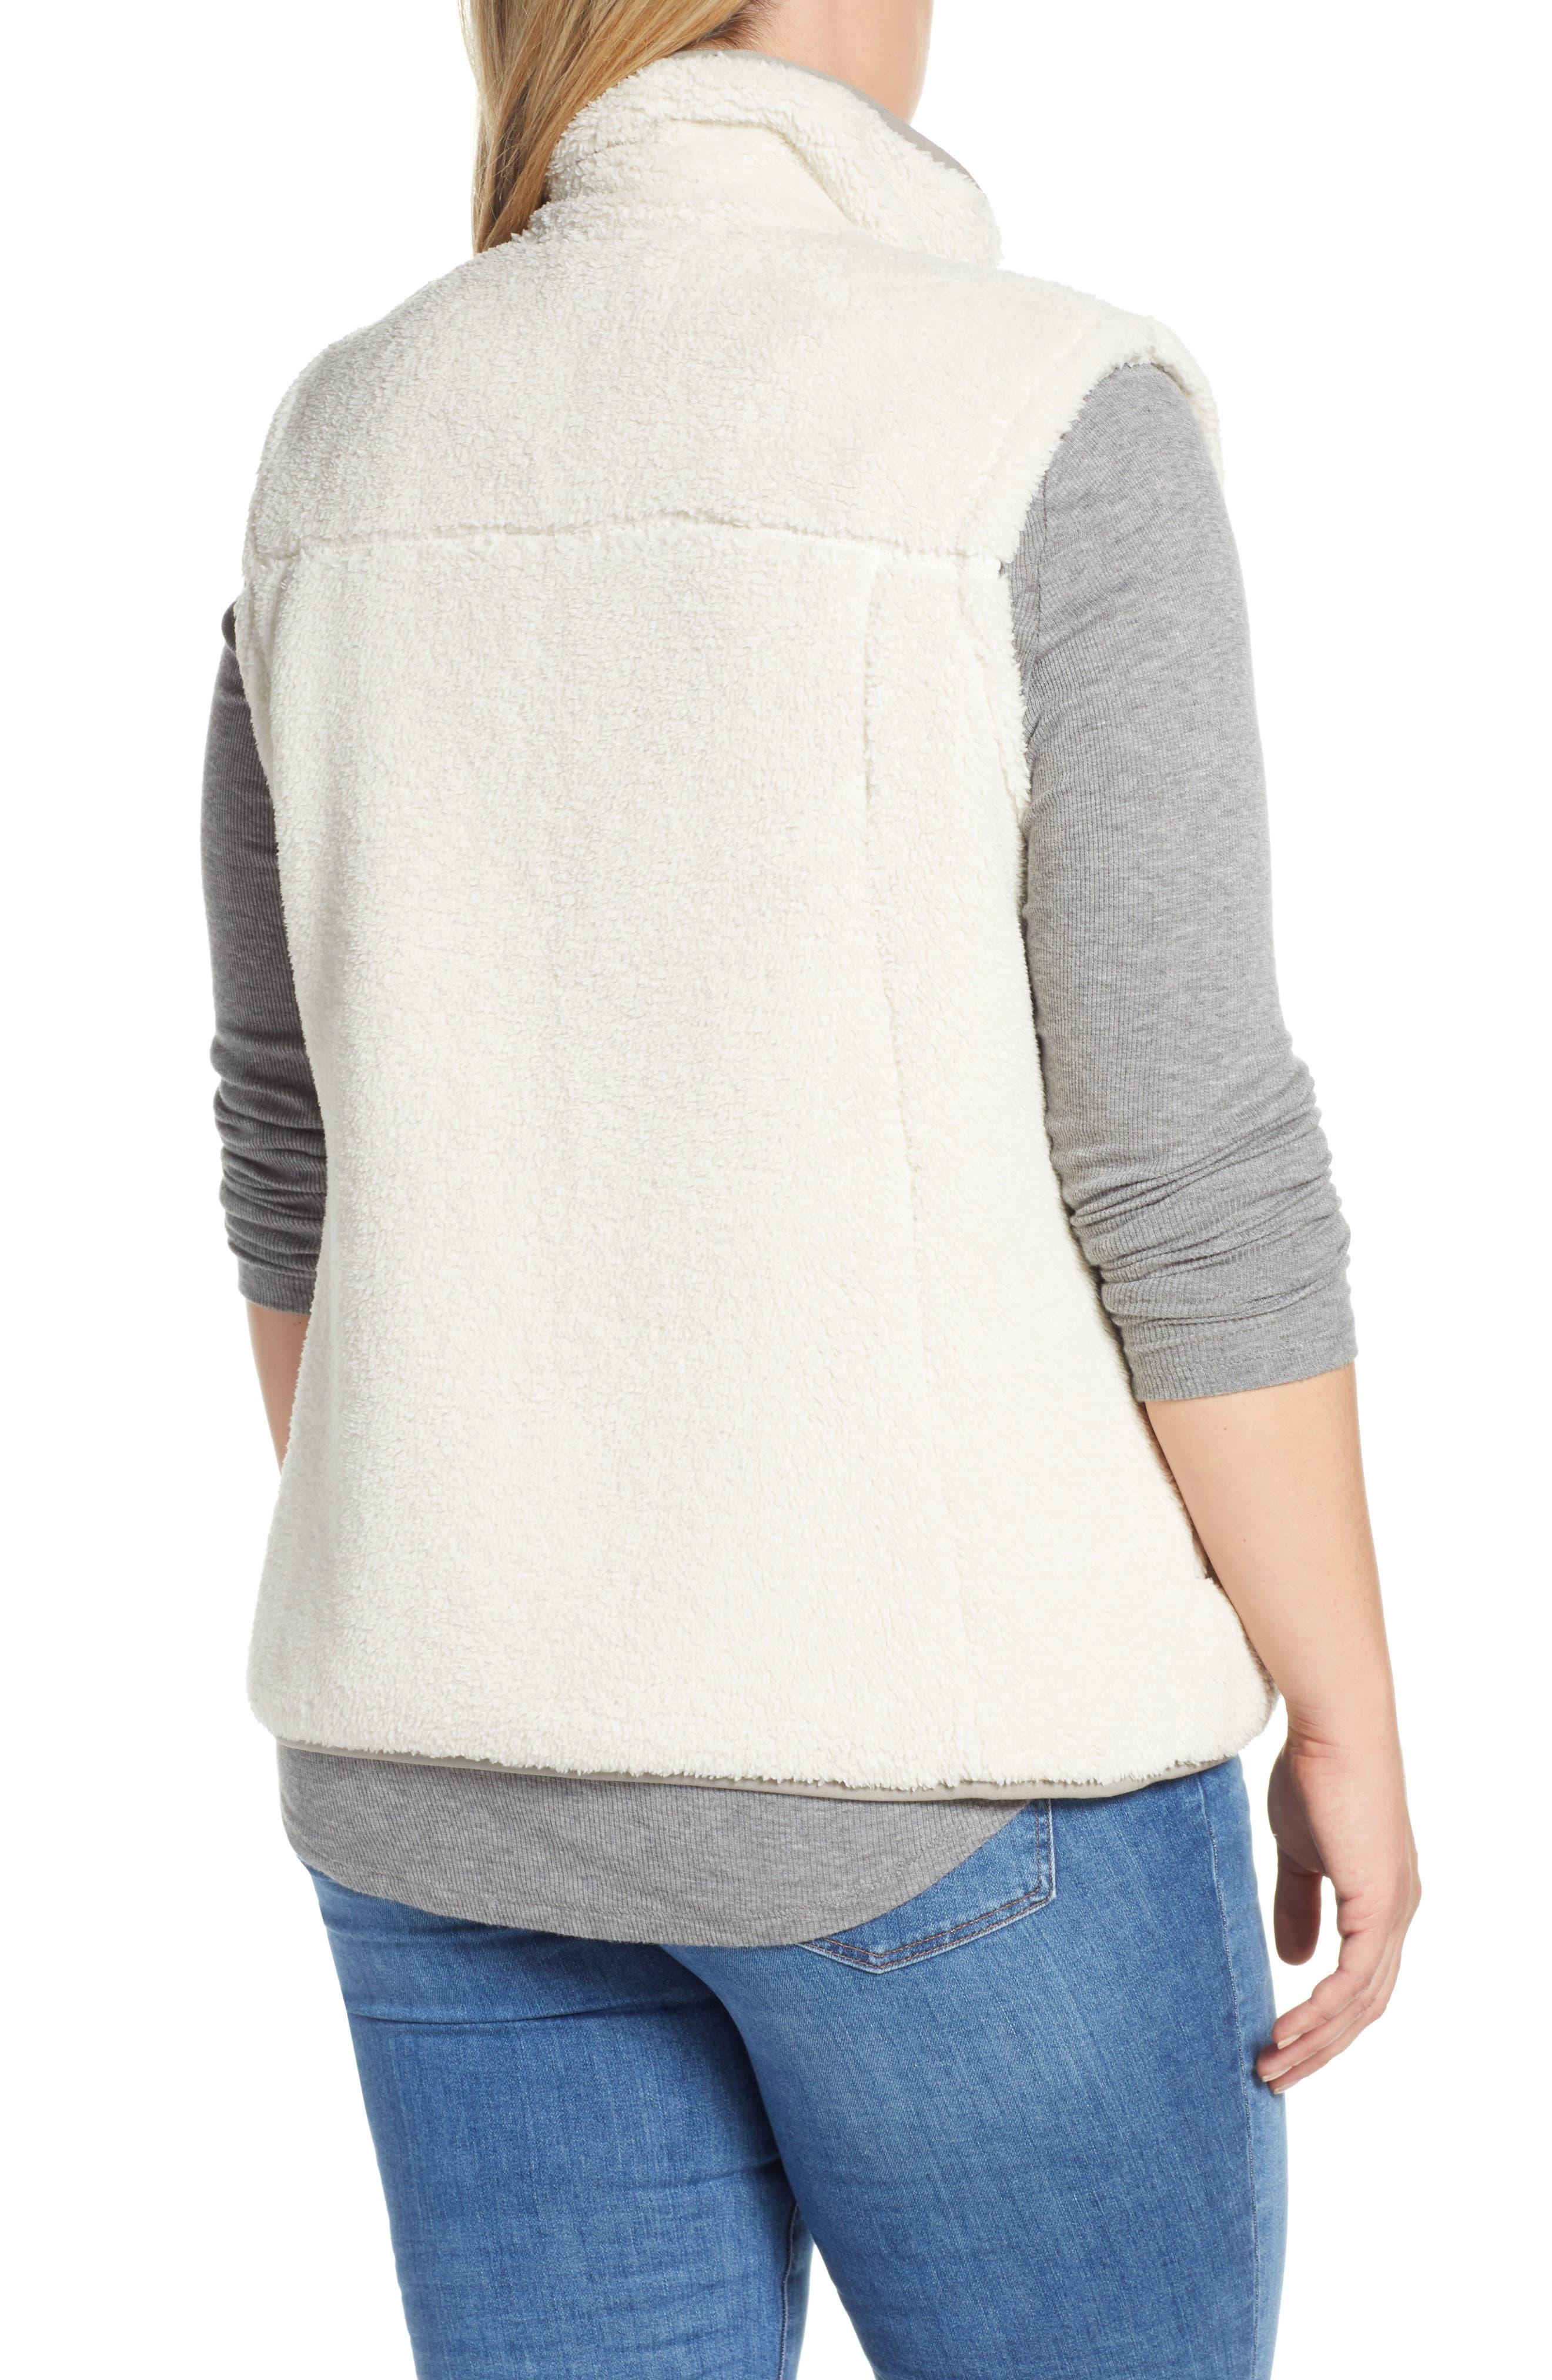 THE NORTH FACE, Campshire Fleece Vest, Alternate thumbnail 3, color, VINTAGE WHITE/ GREY